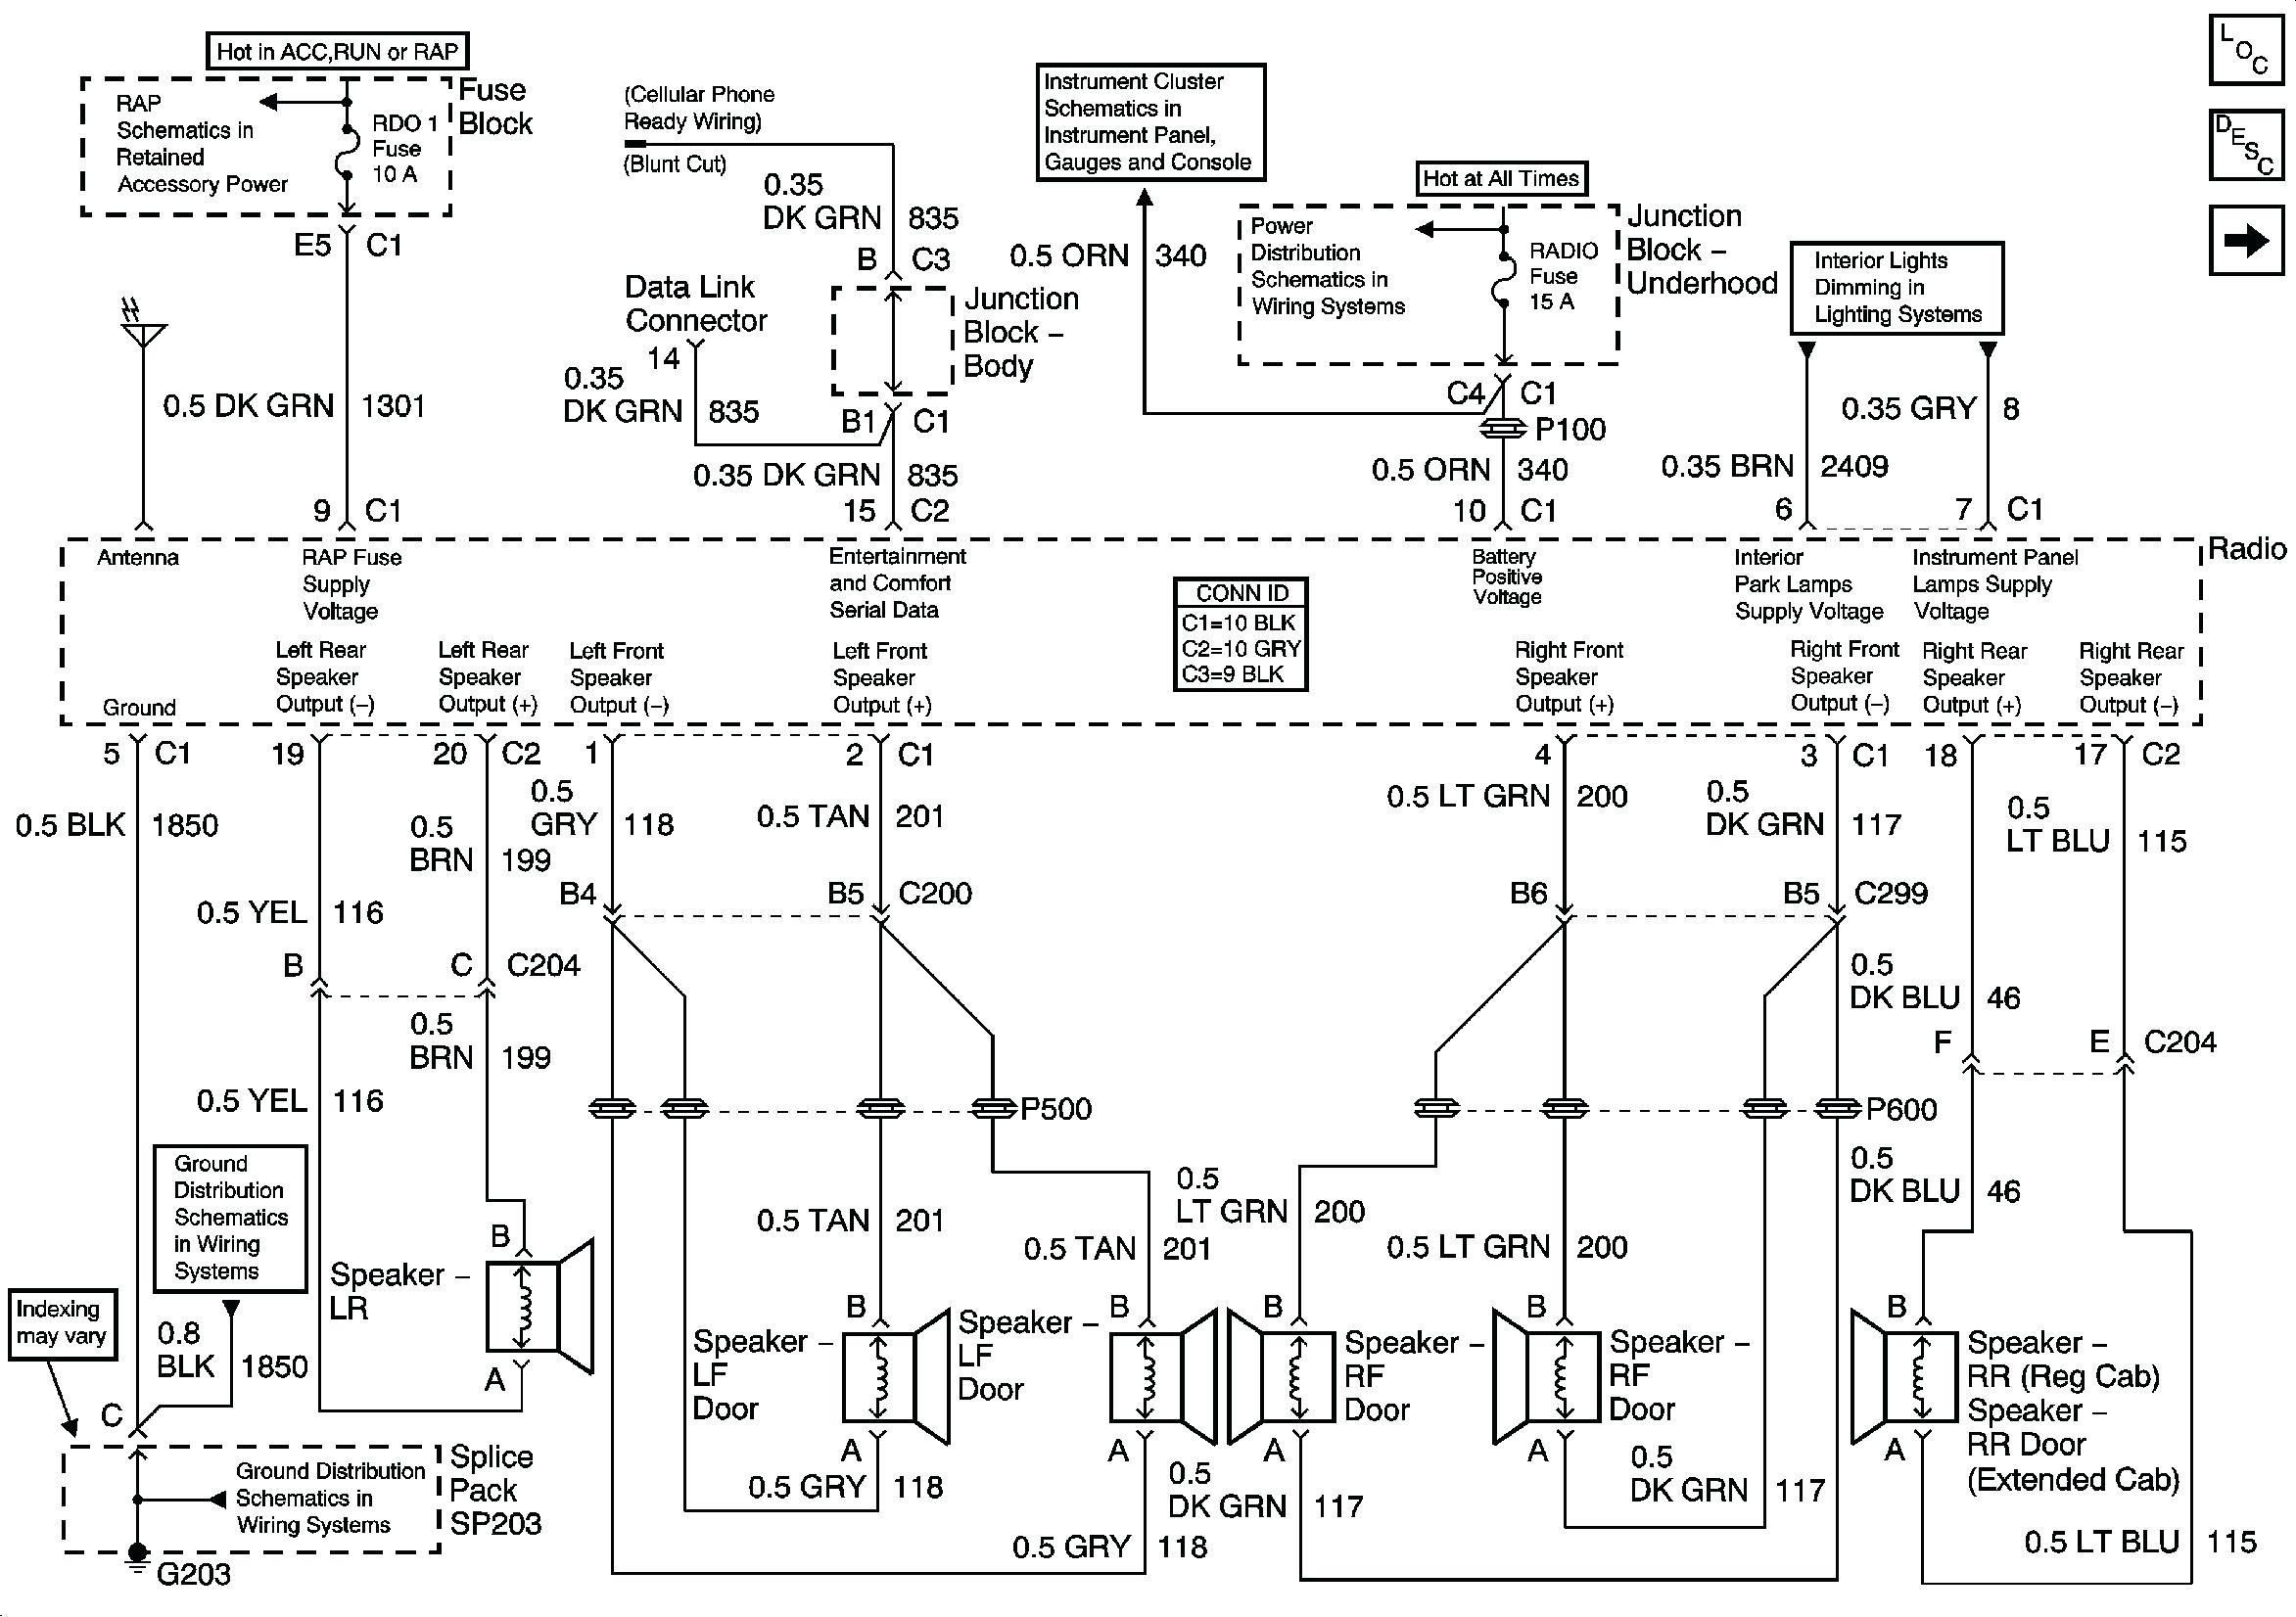 2007 chevy silverado classic radio wiring diagram wiring diagram 2007 chevy silverado classic radio wiring diagram 2001 chevy silverado 1500 wiring diagram 2006 silverado